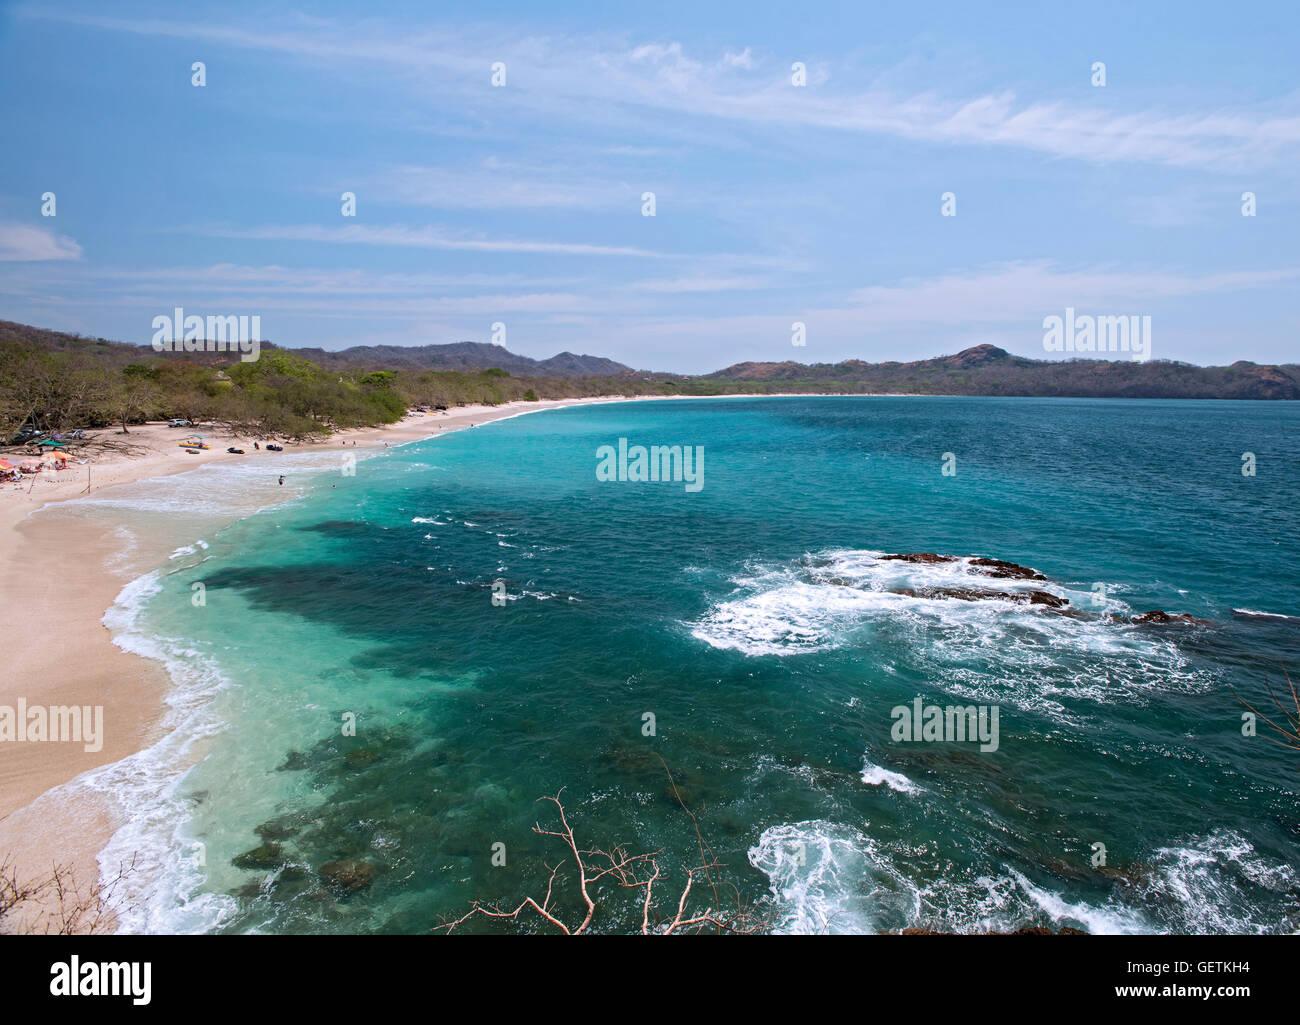 Playa Conchal, Costa Rica - Stock Image